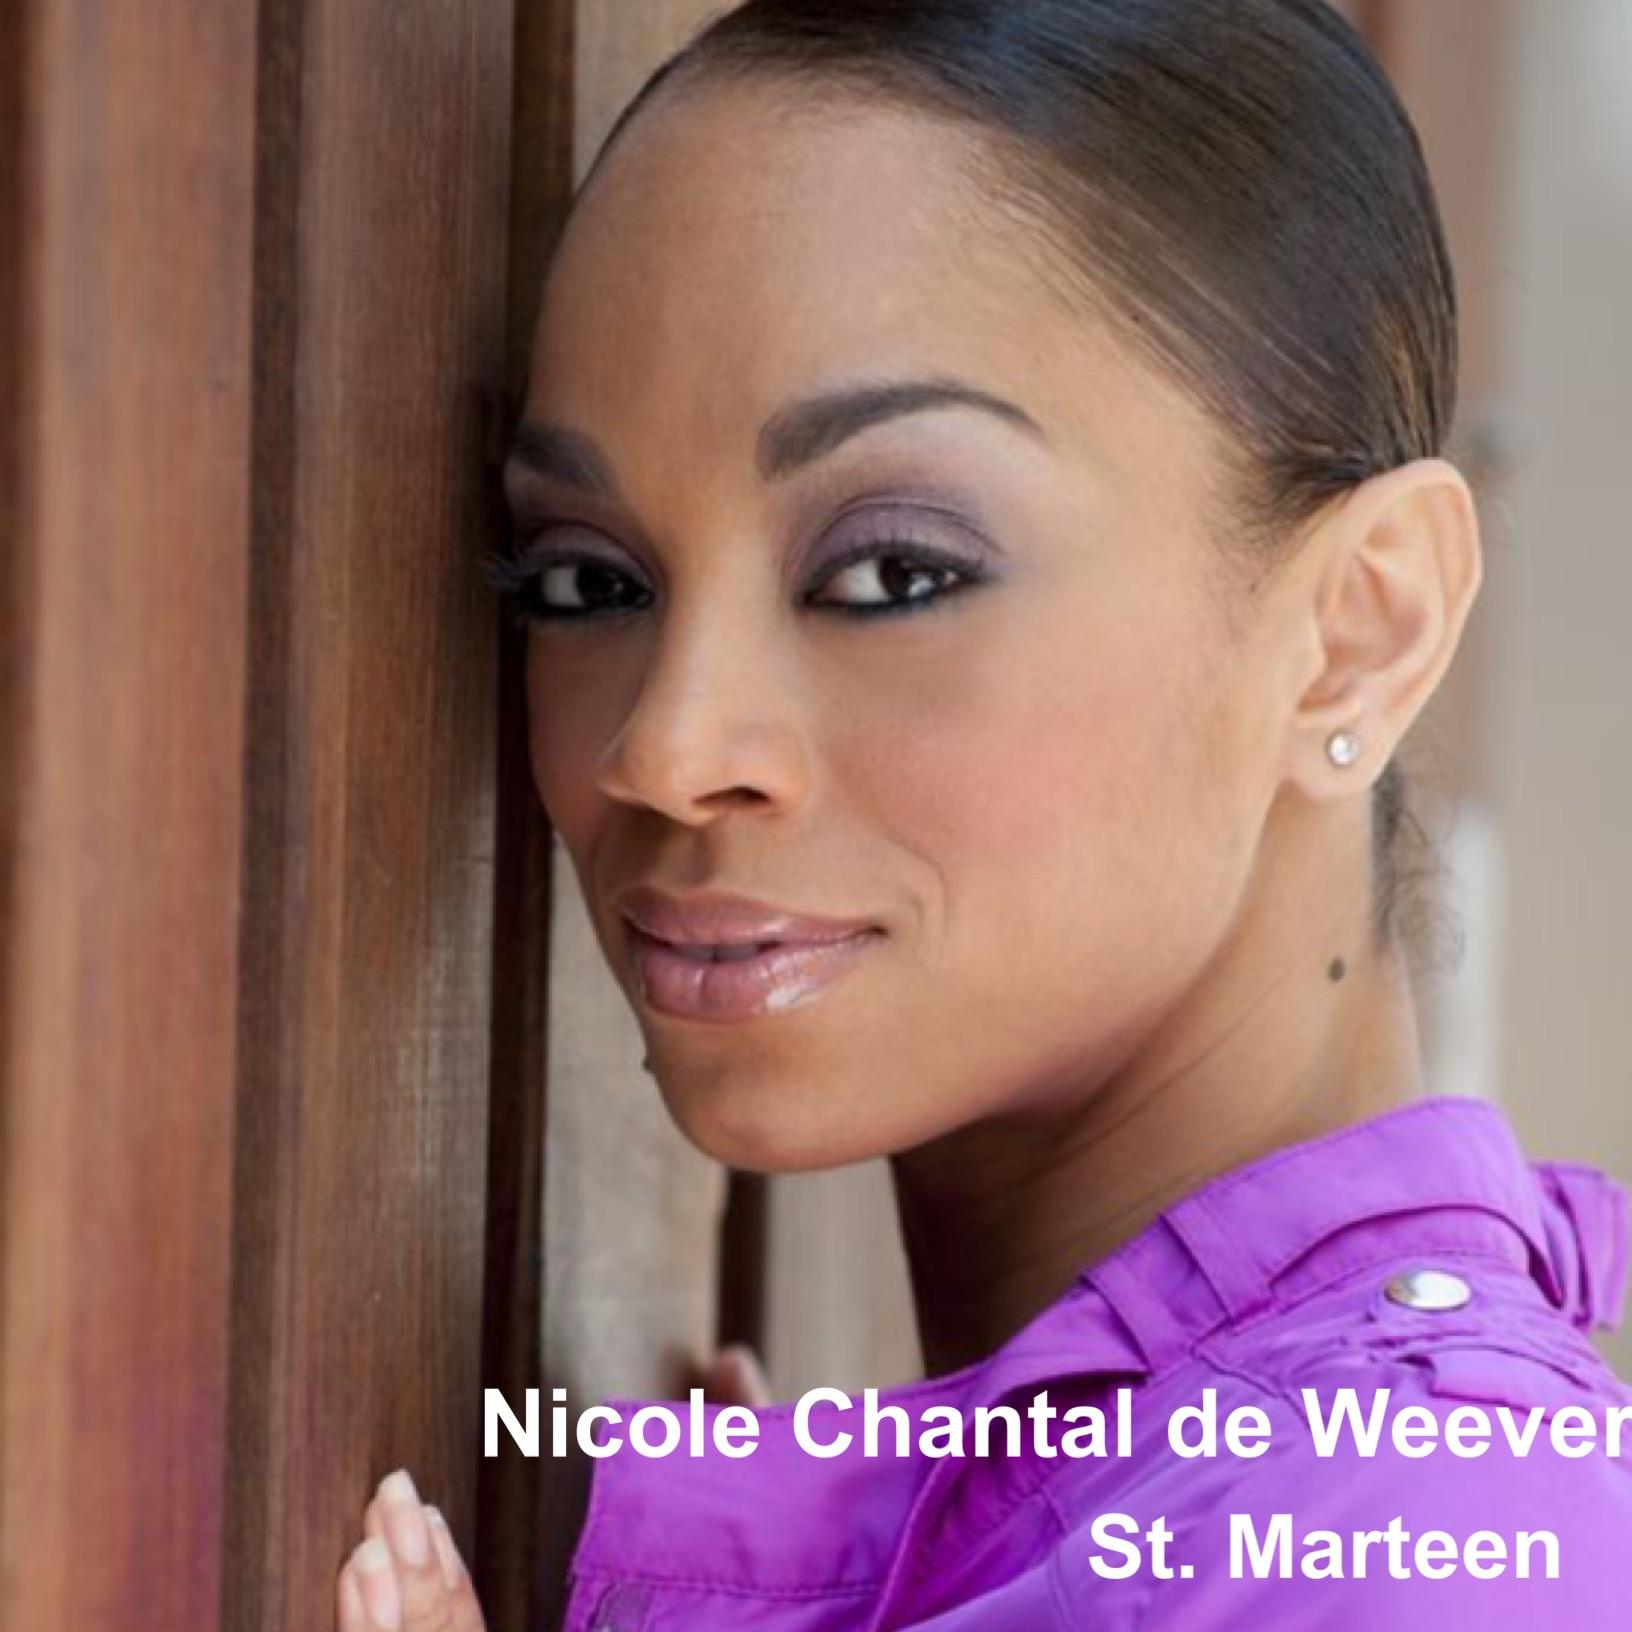 Nicole Chantal